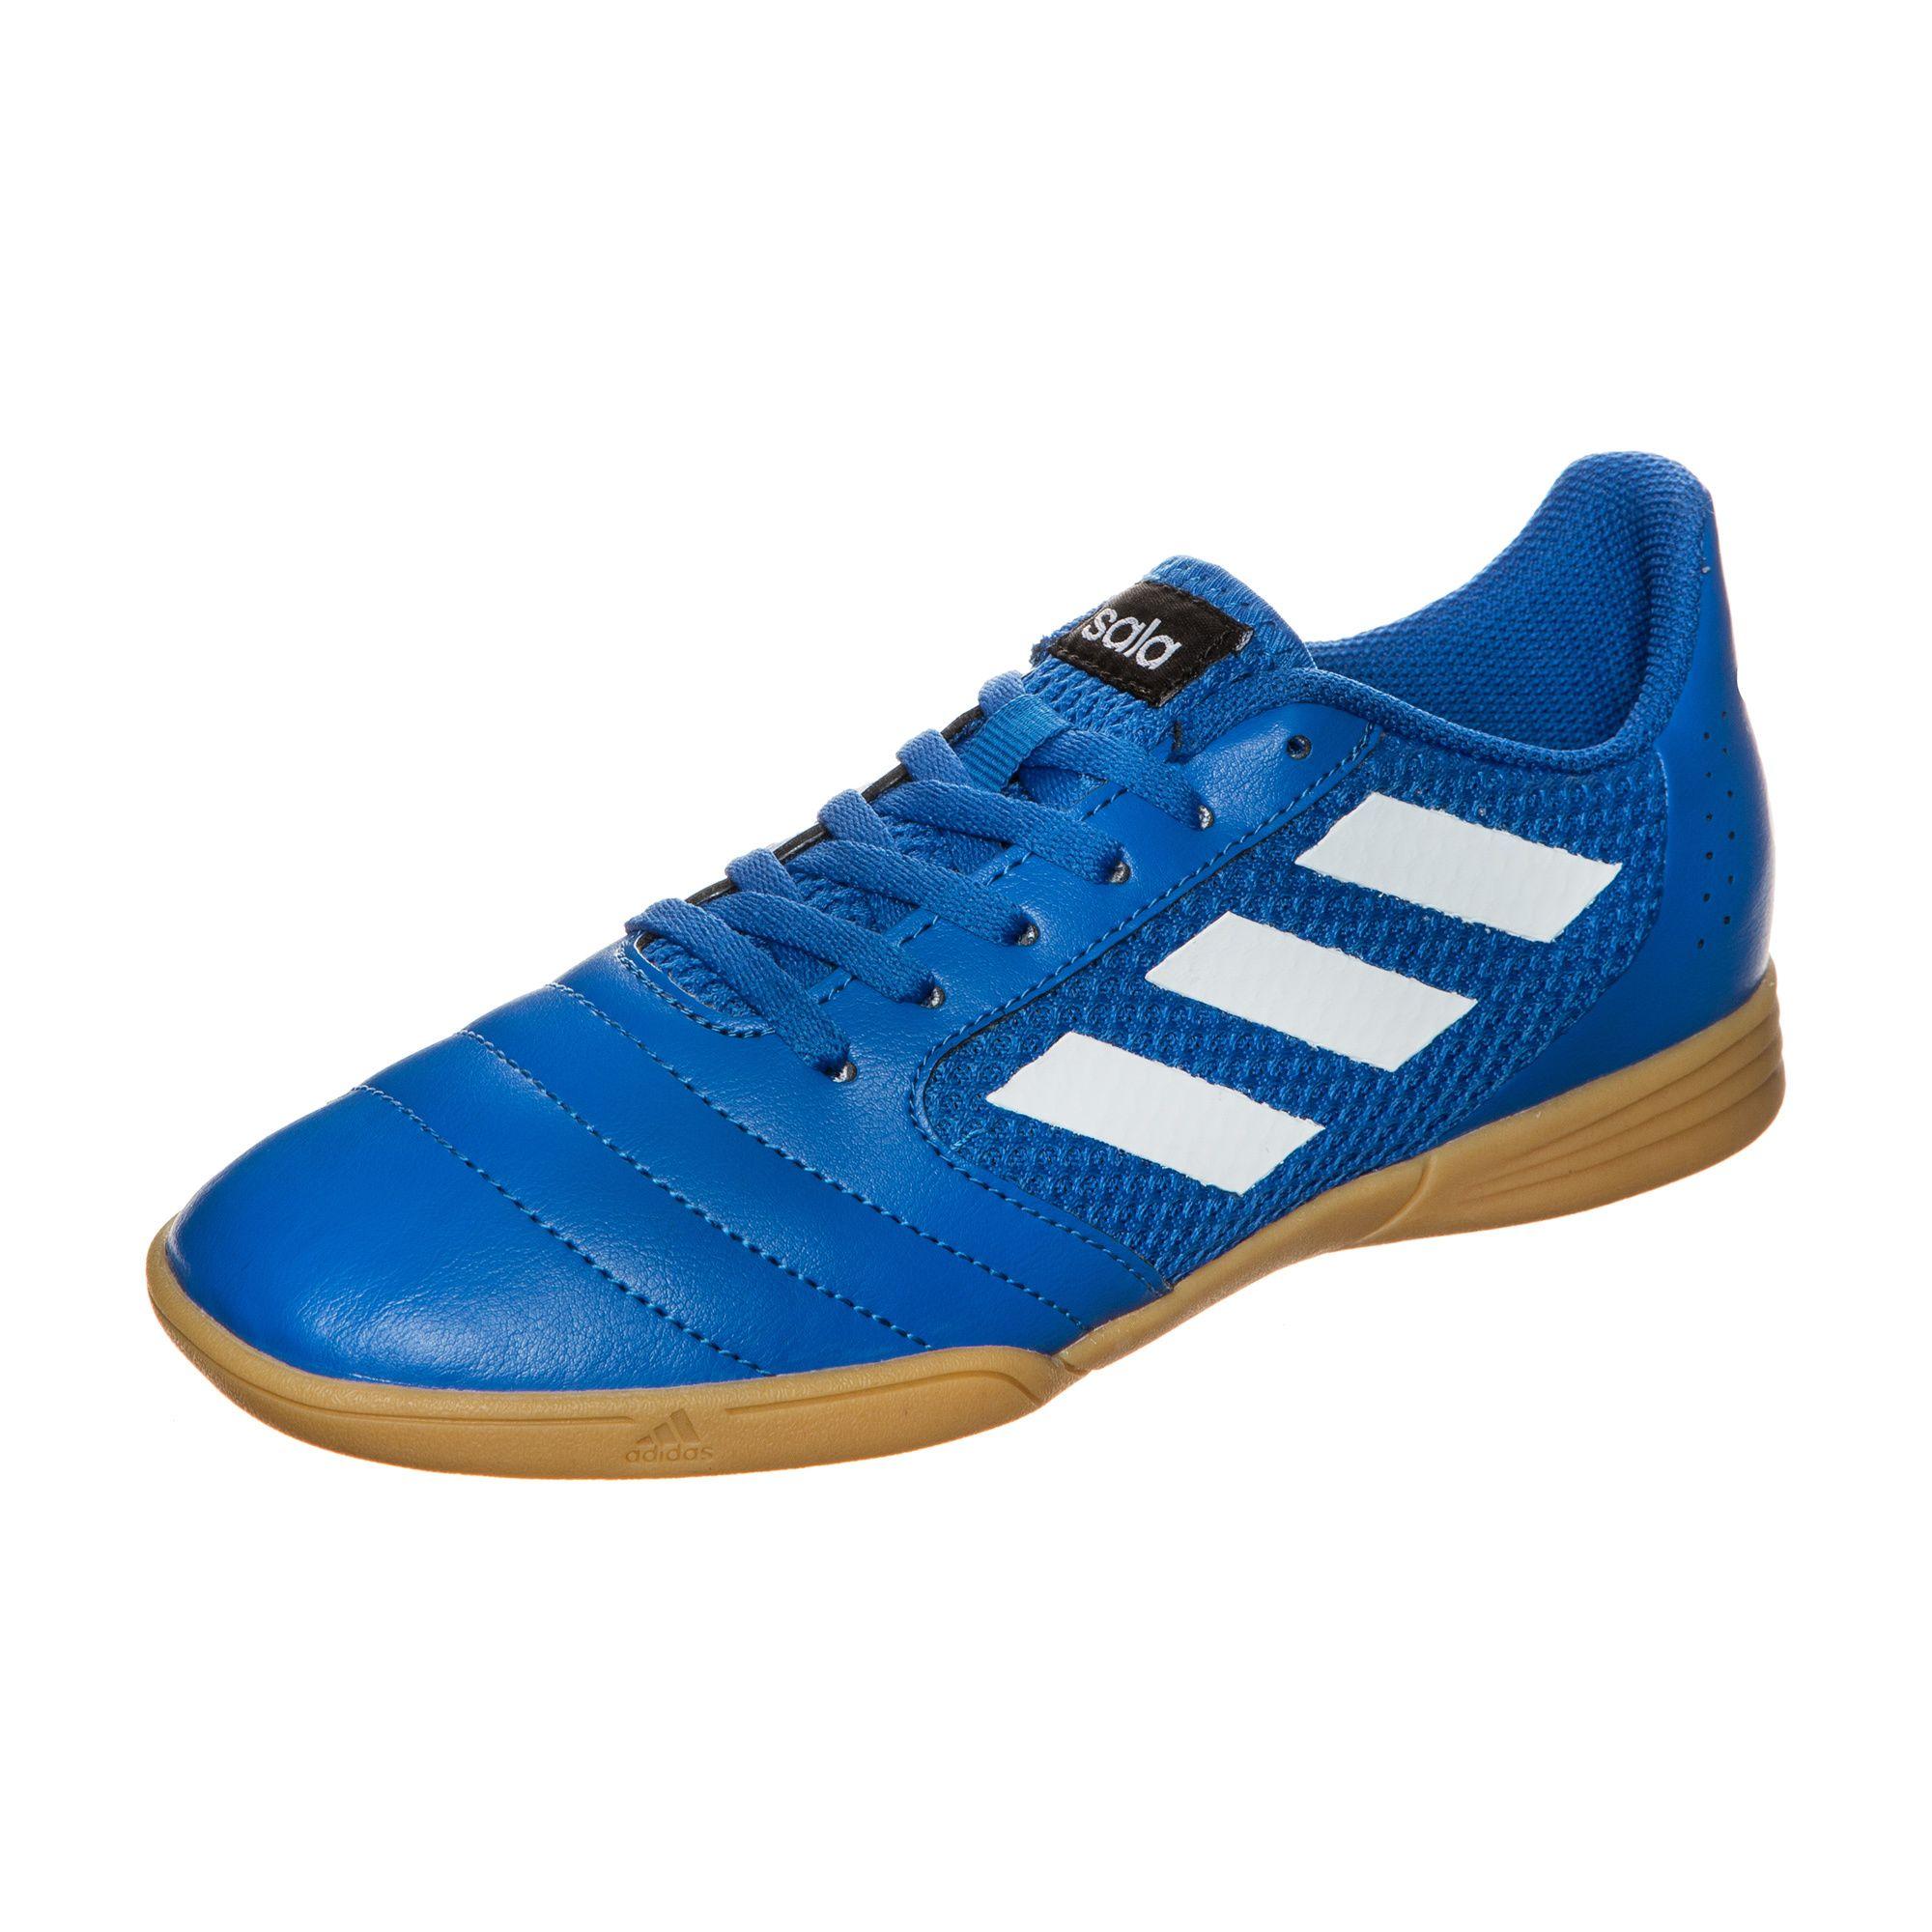 ADIDAS PERFORMANCE adidas Performance ACE 17.4 Sala Indoor Fußballschuh Kinder